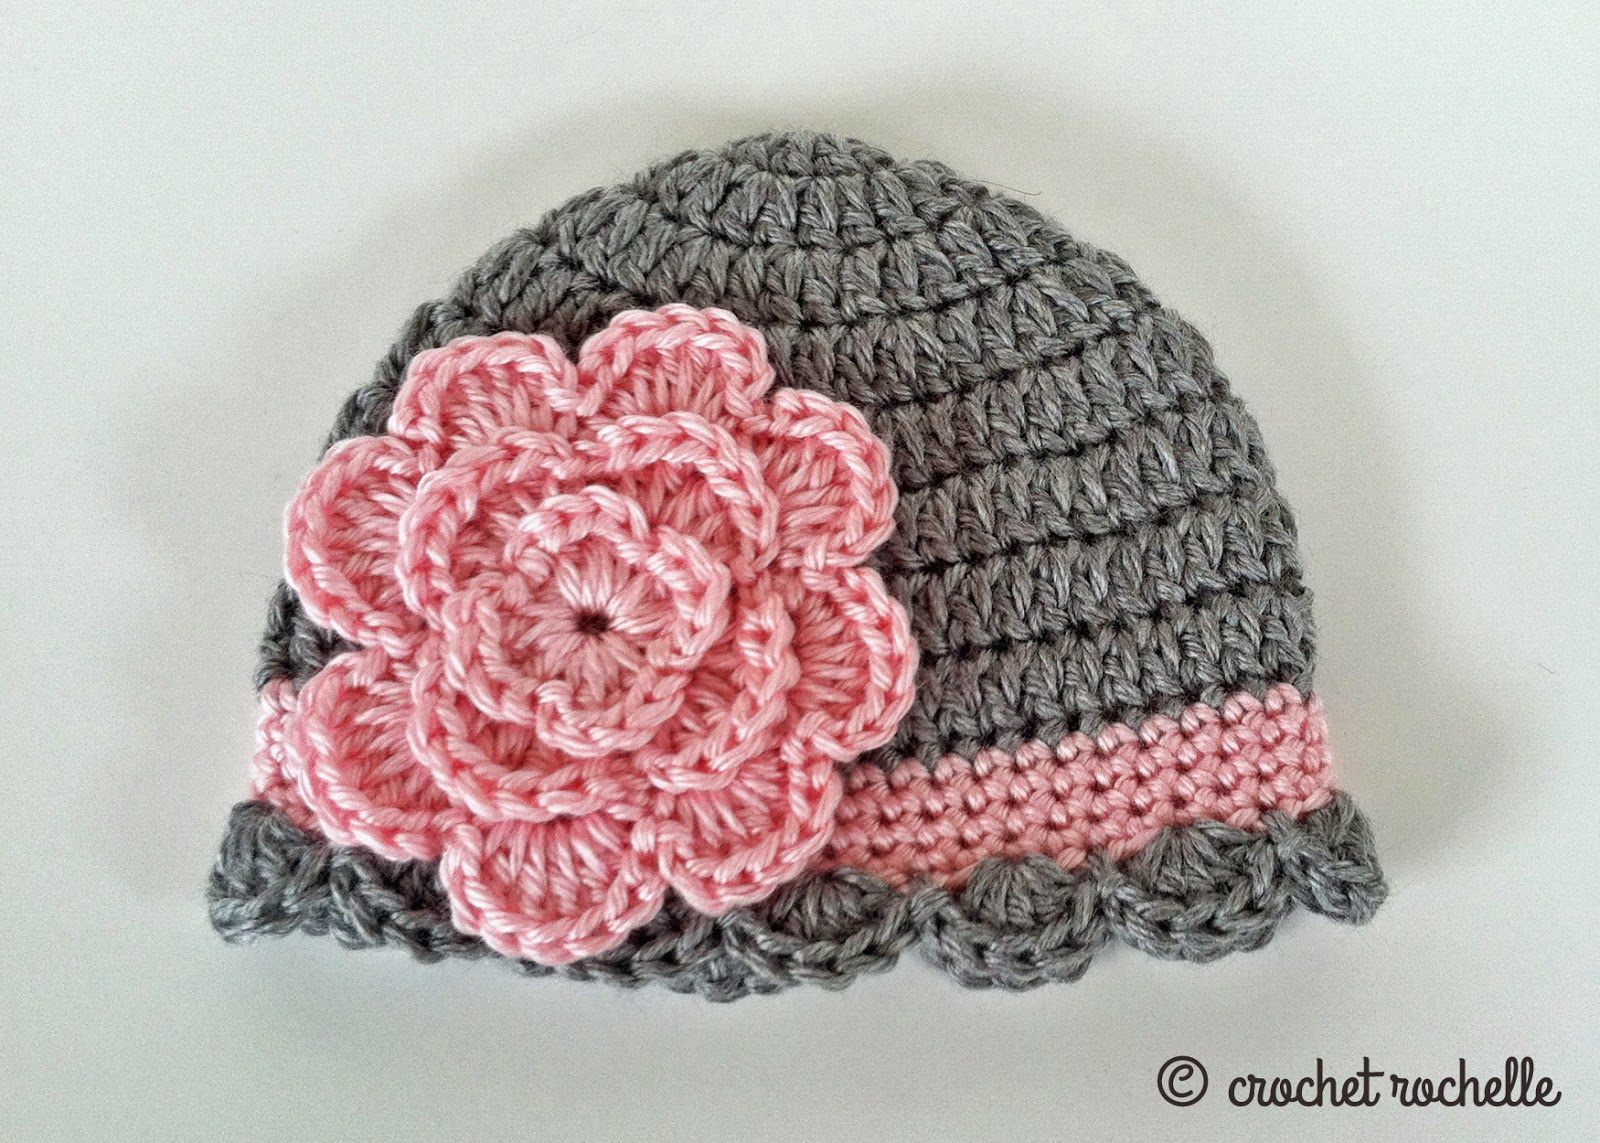 51b851ae0 Crochet Rochelle: Pretty Baby Beanie